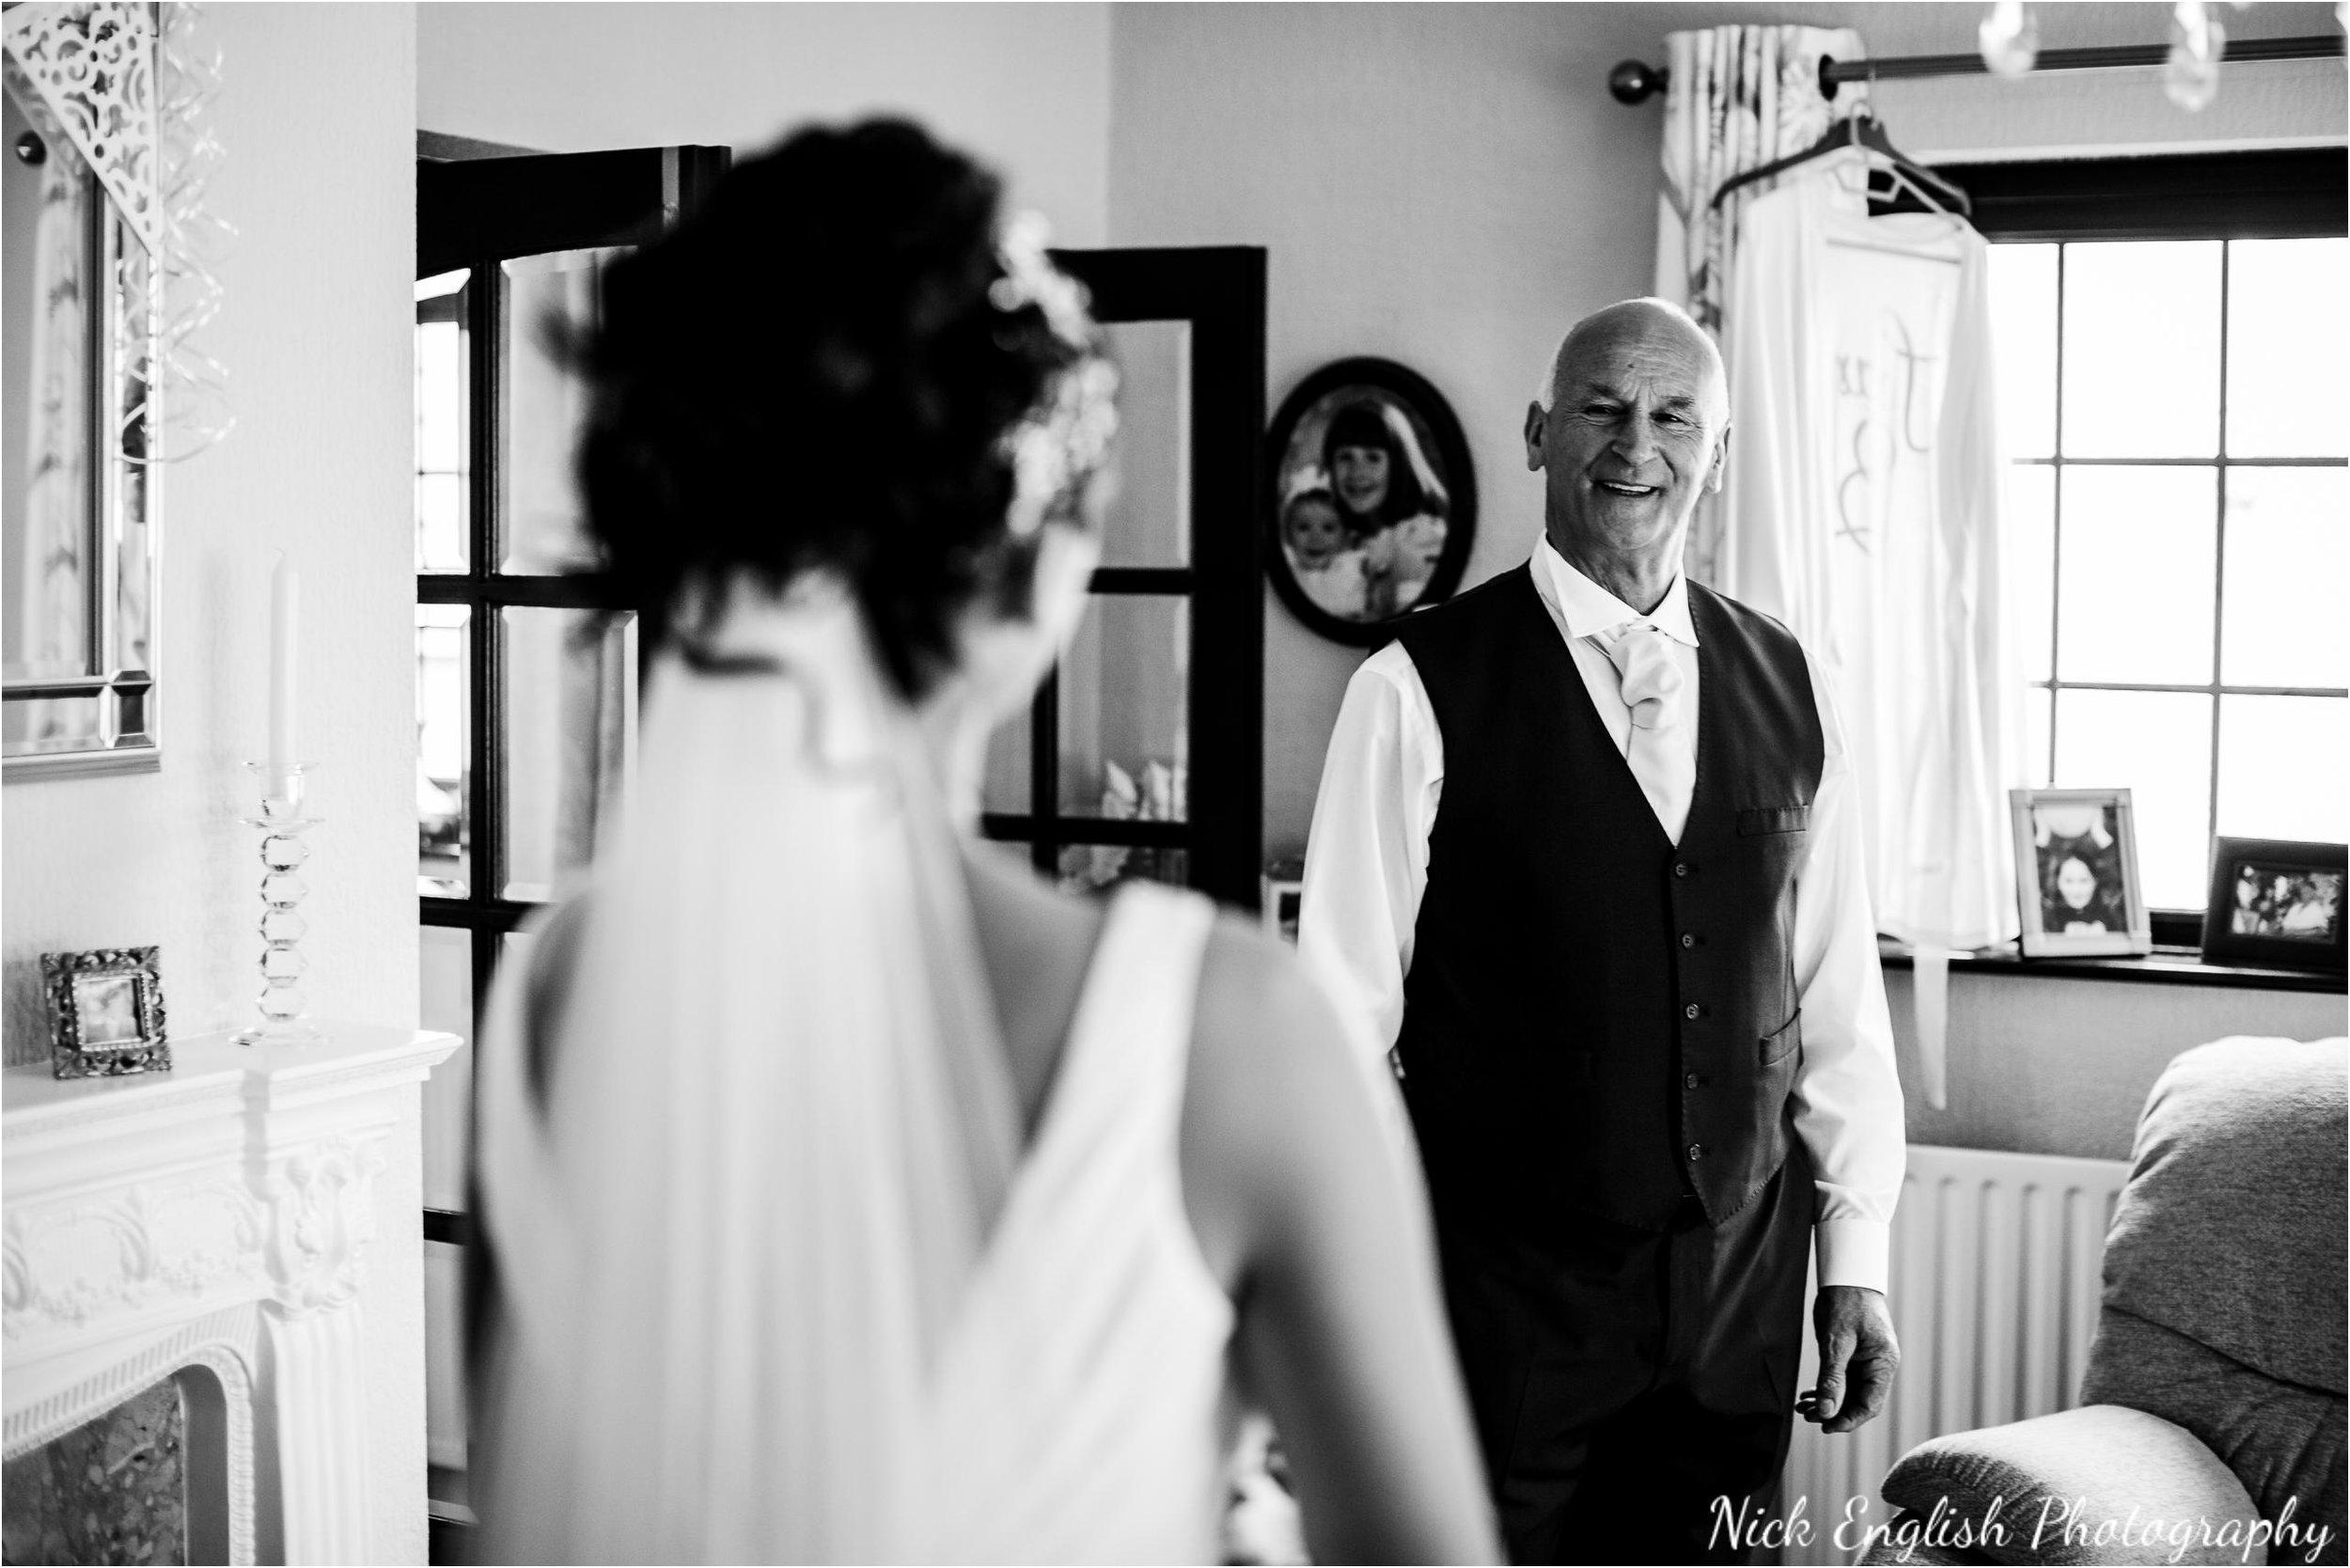 Emily David Wedding Photographs at Barton Grange Preston by Nick English Photography 37jpg.jpeg